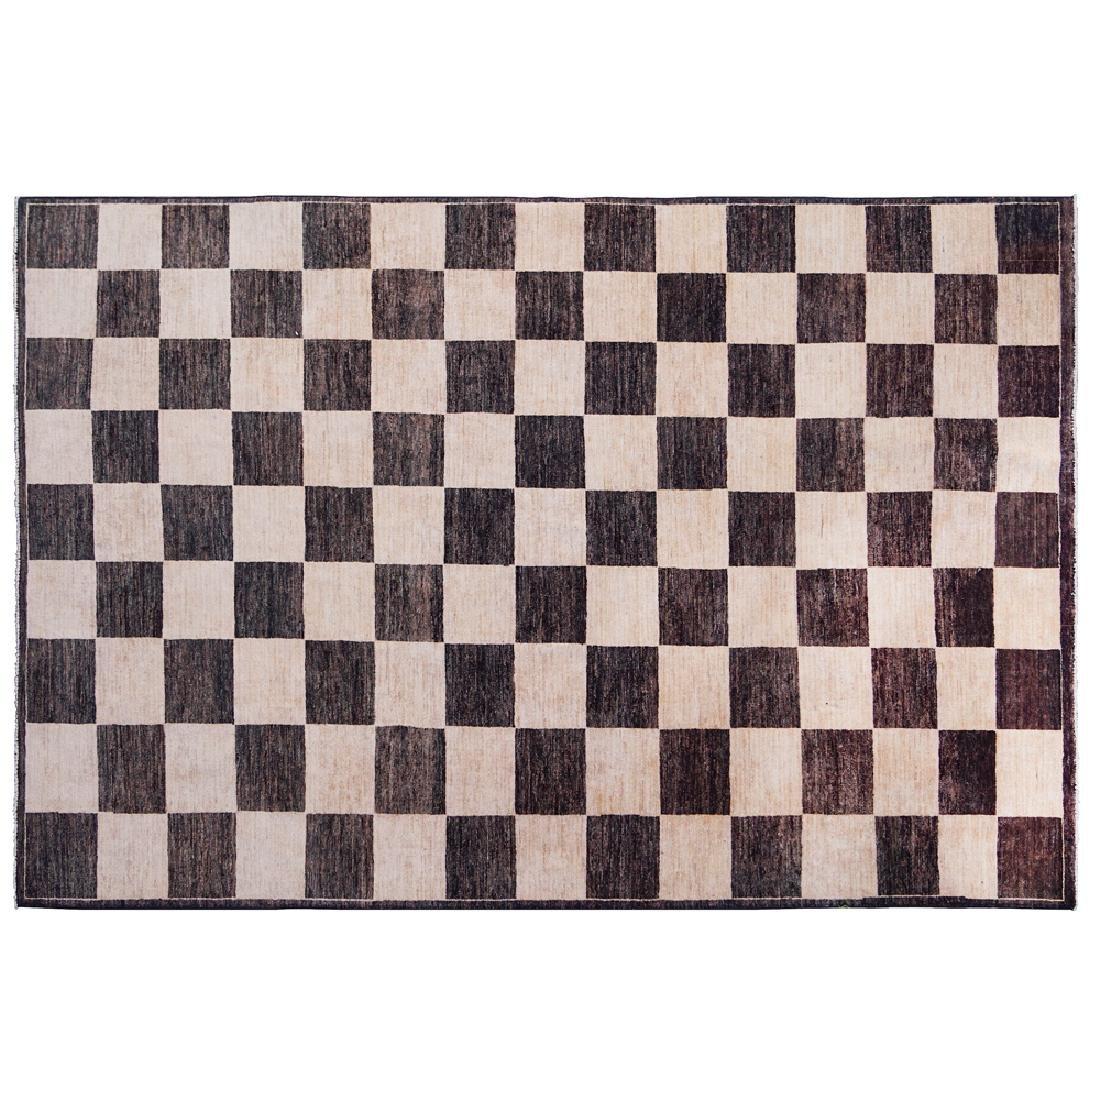 Zigler Gabbeh carpet Pakistan 20th century 296x200 cm.